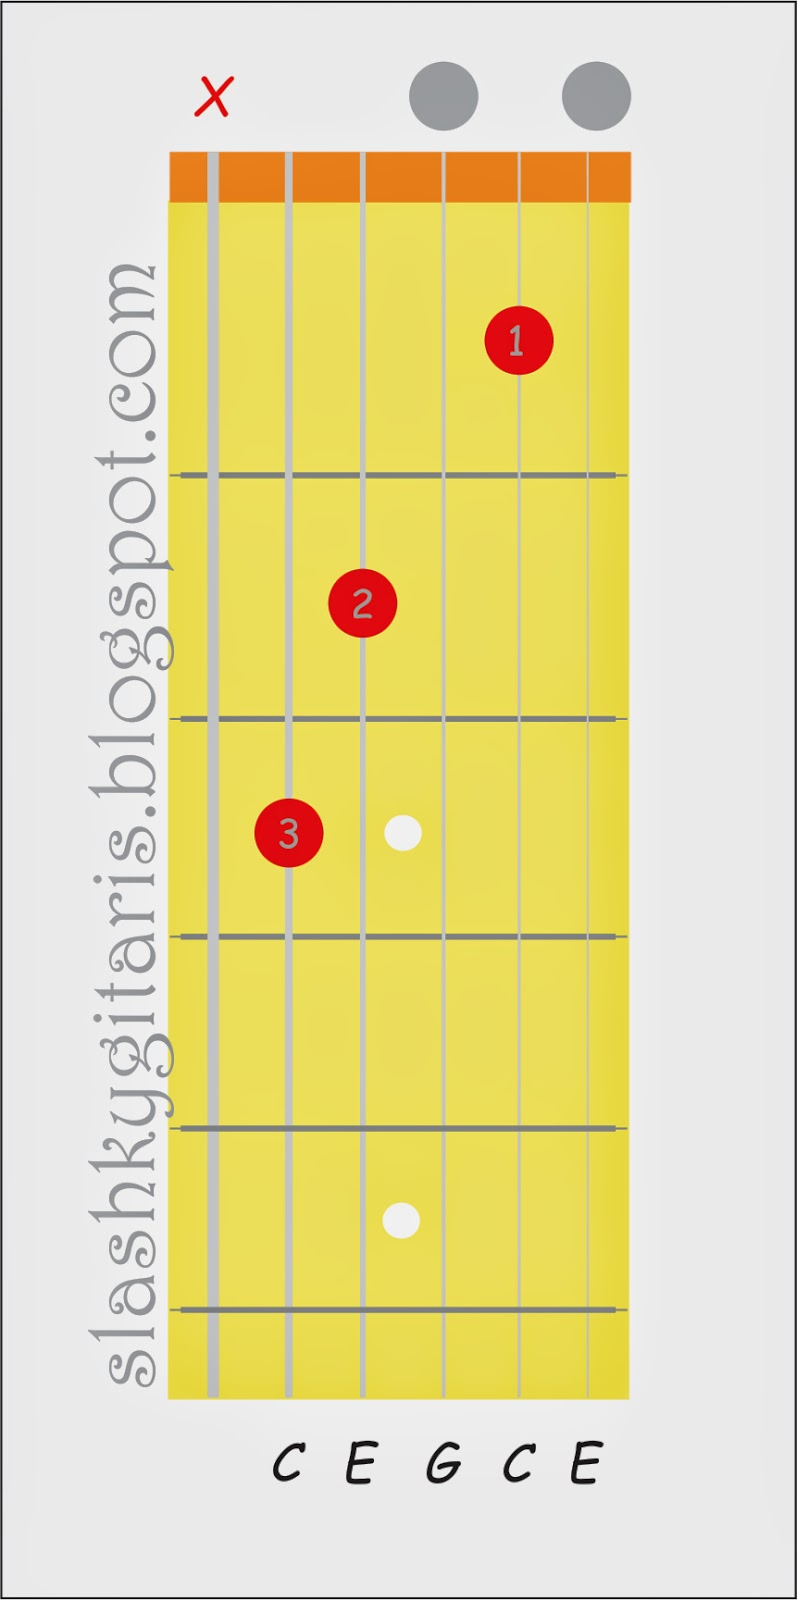 belajar chord gitar, belajar gitar, belajar gitar pemula, belajar kunci gitar, kunci C mayor, kunci gitar,